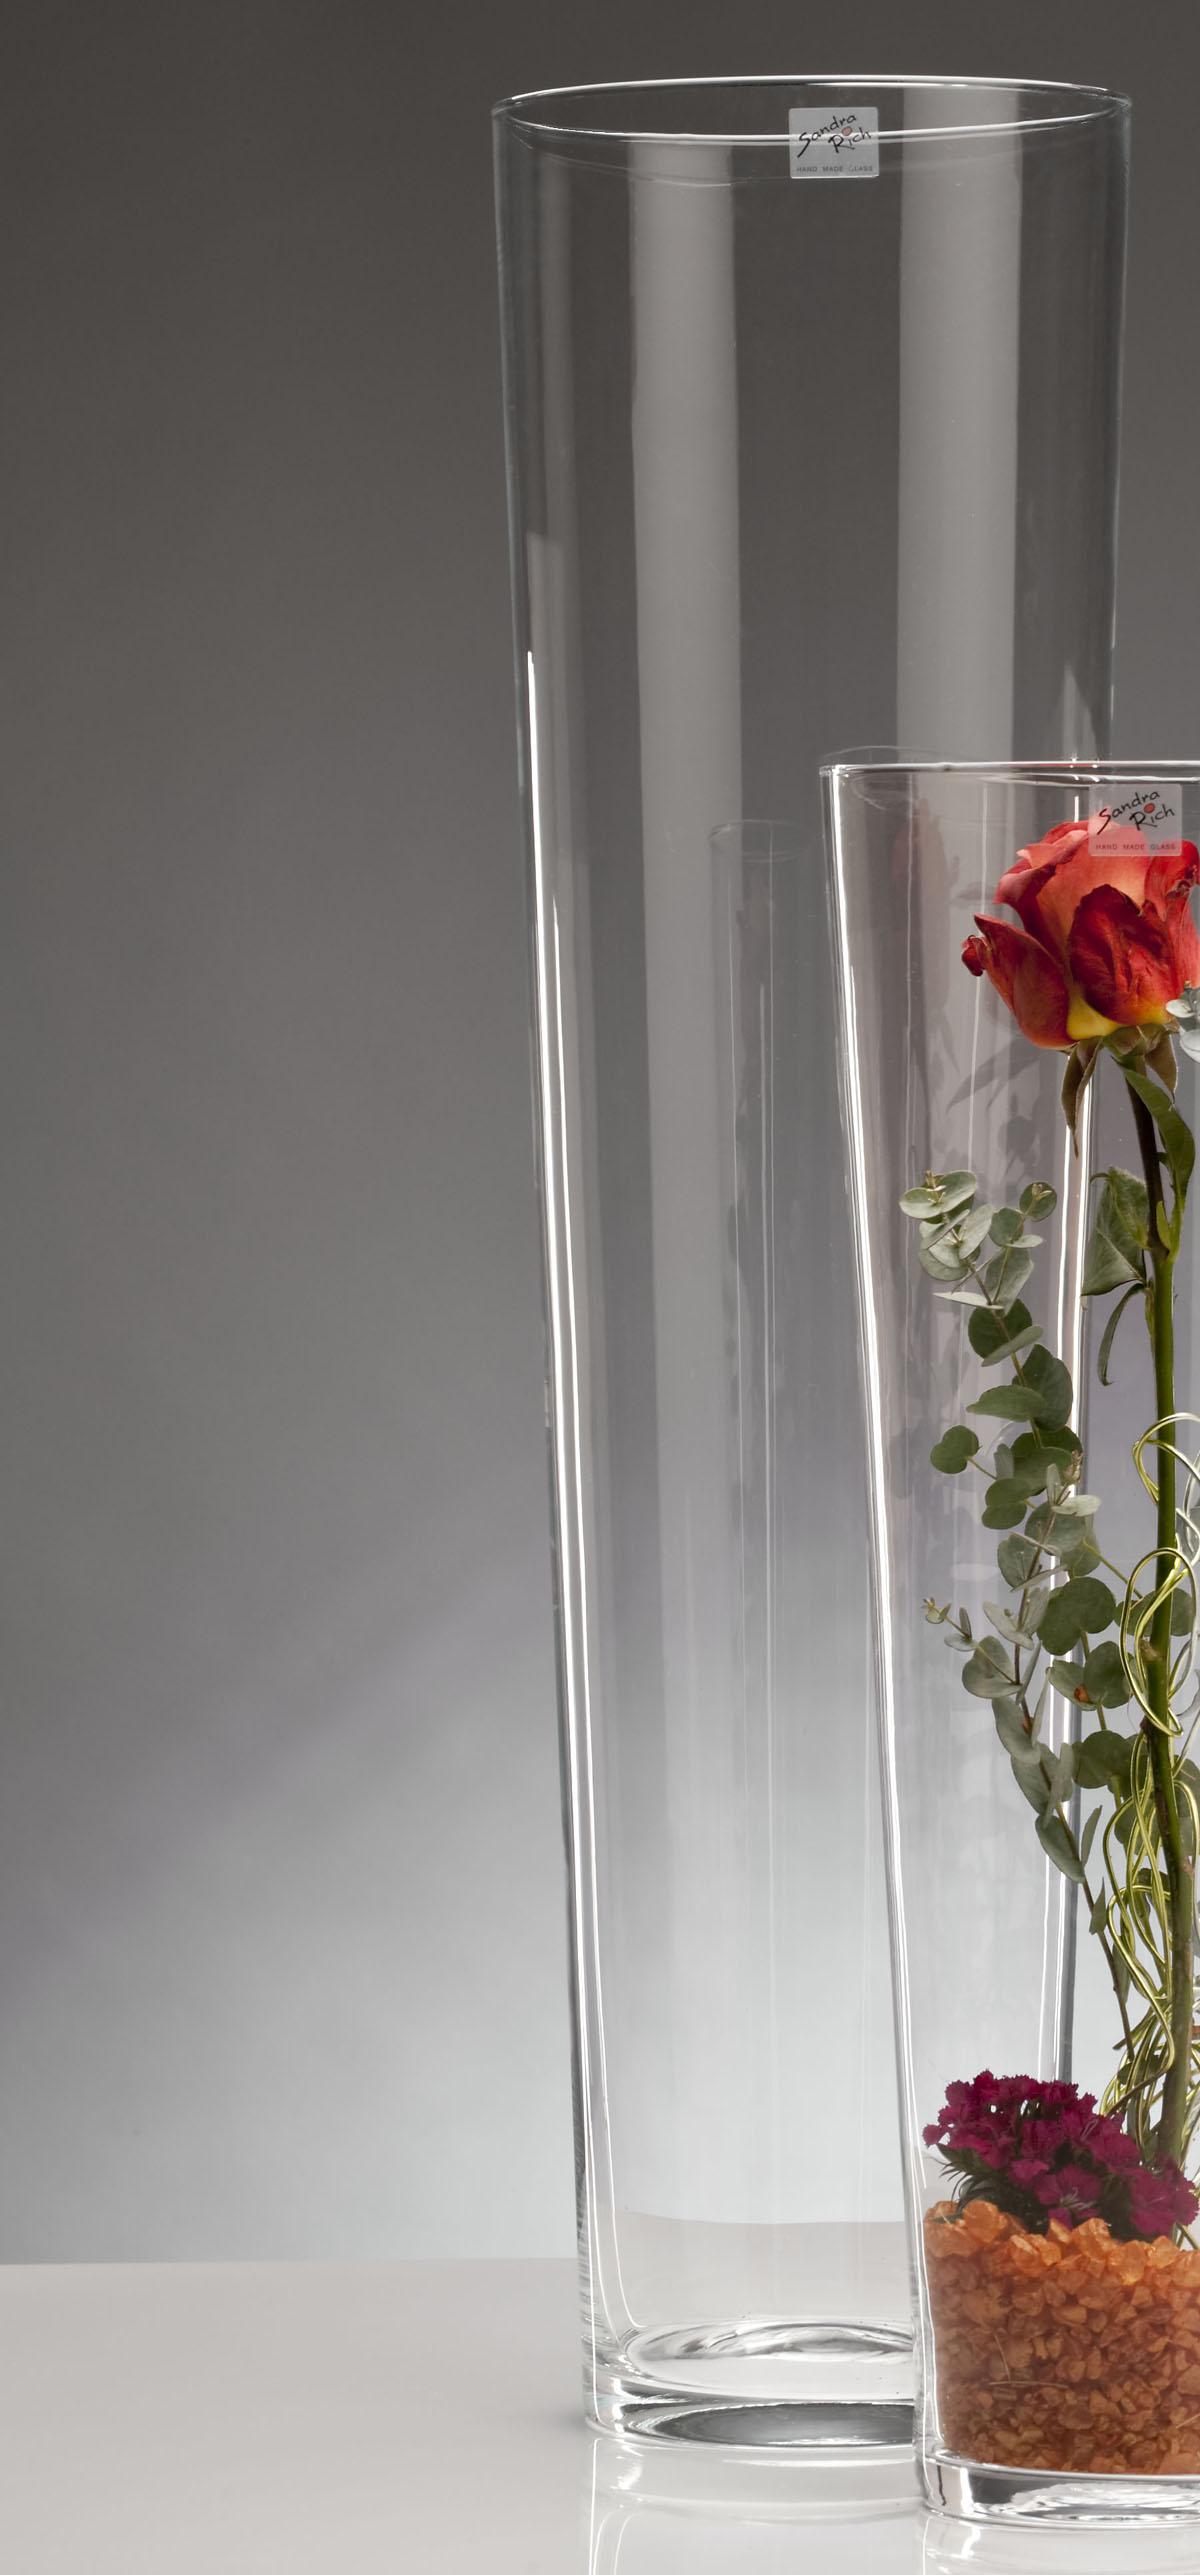 glasvase bodenvase dekoglas conical konisch rund h 70cm 19cm glas sandra rich. Black Bedroom Furniture Sets. Home Design Ideas